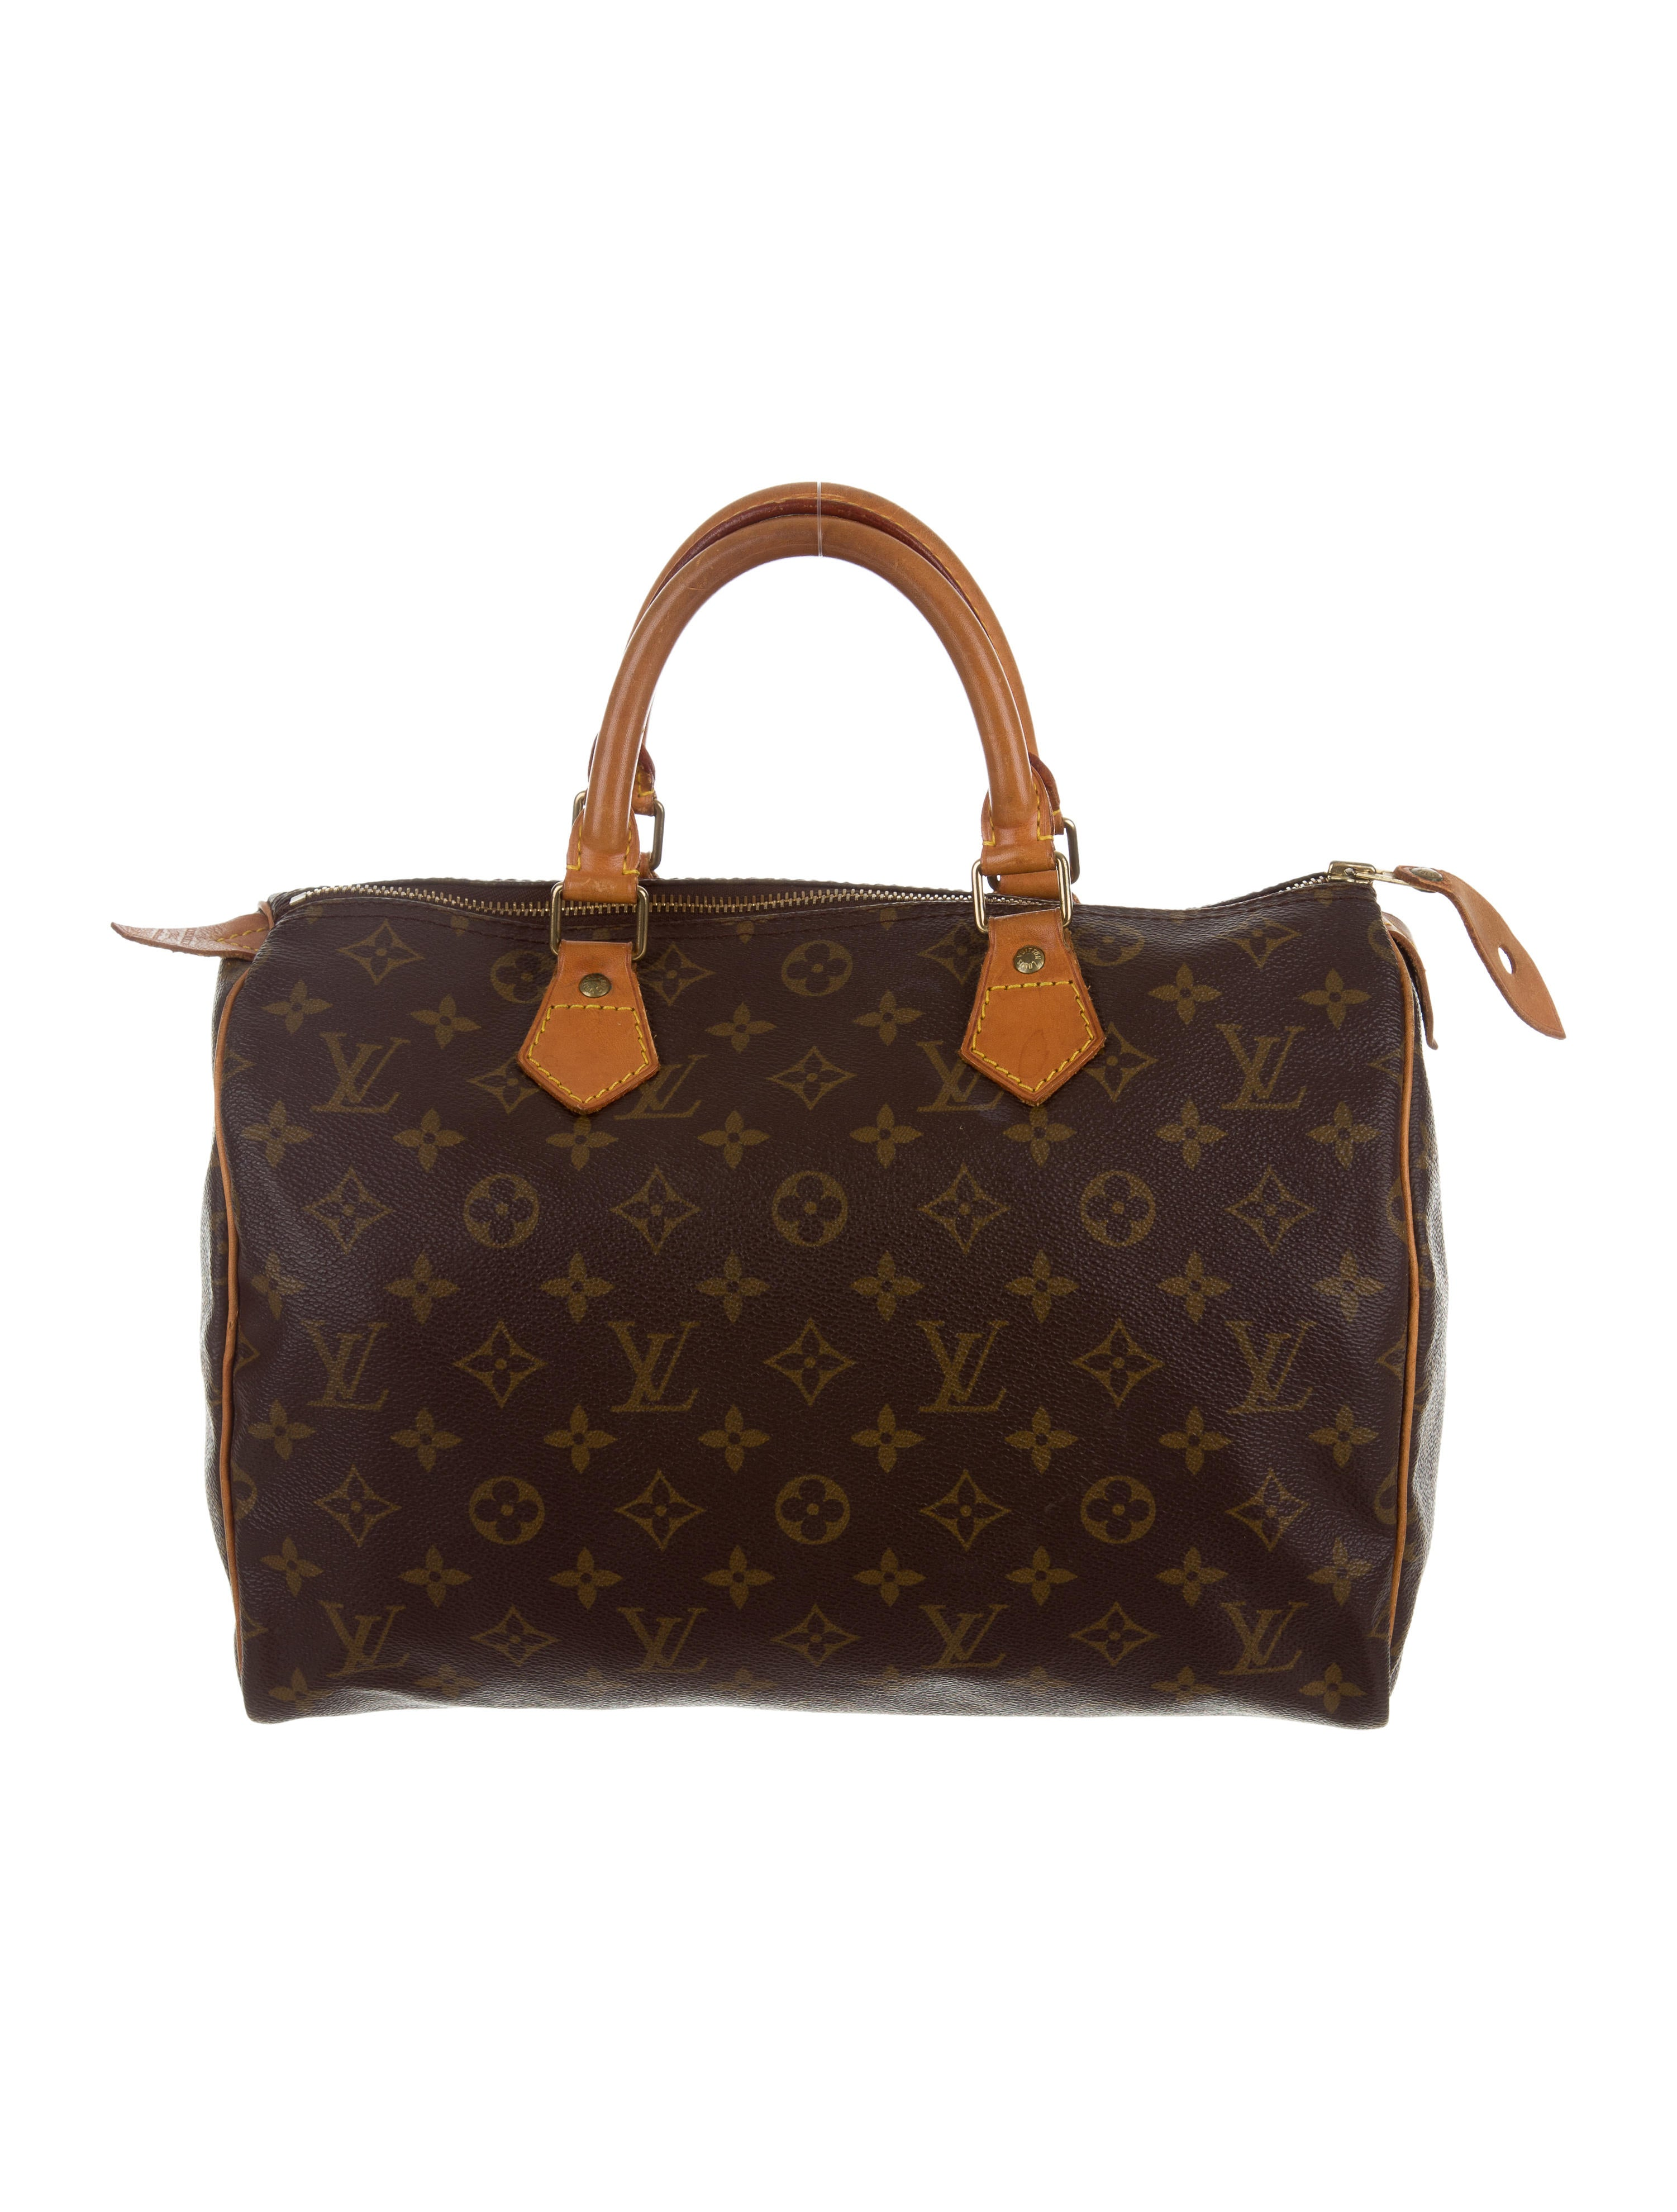 Louis vuitton monogram speedy 30 handbags lou119990 for Louis vuitton miroir speedy 30